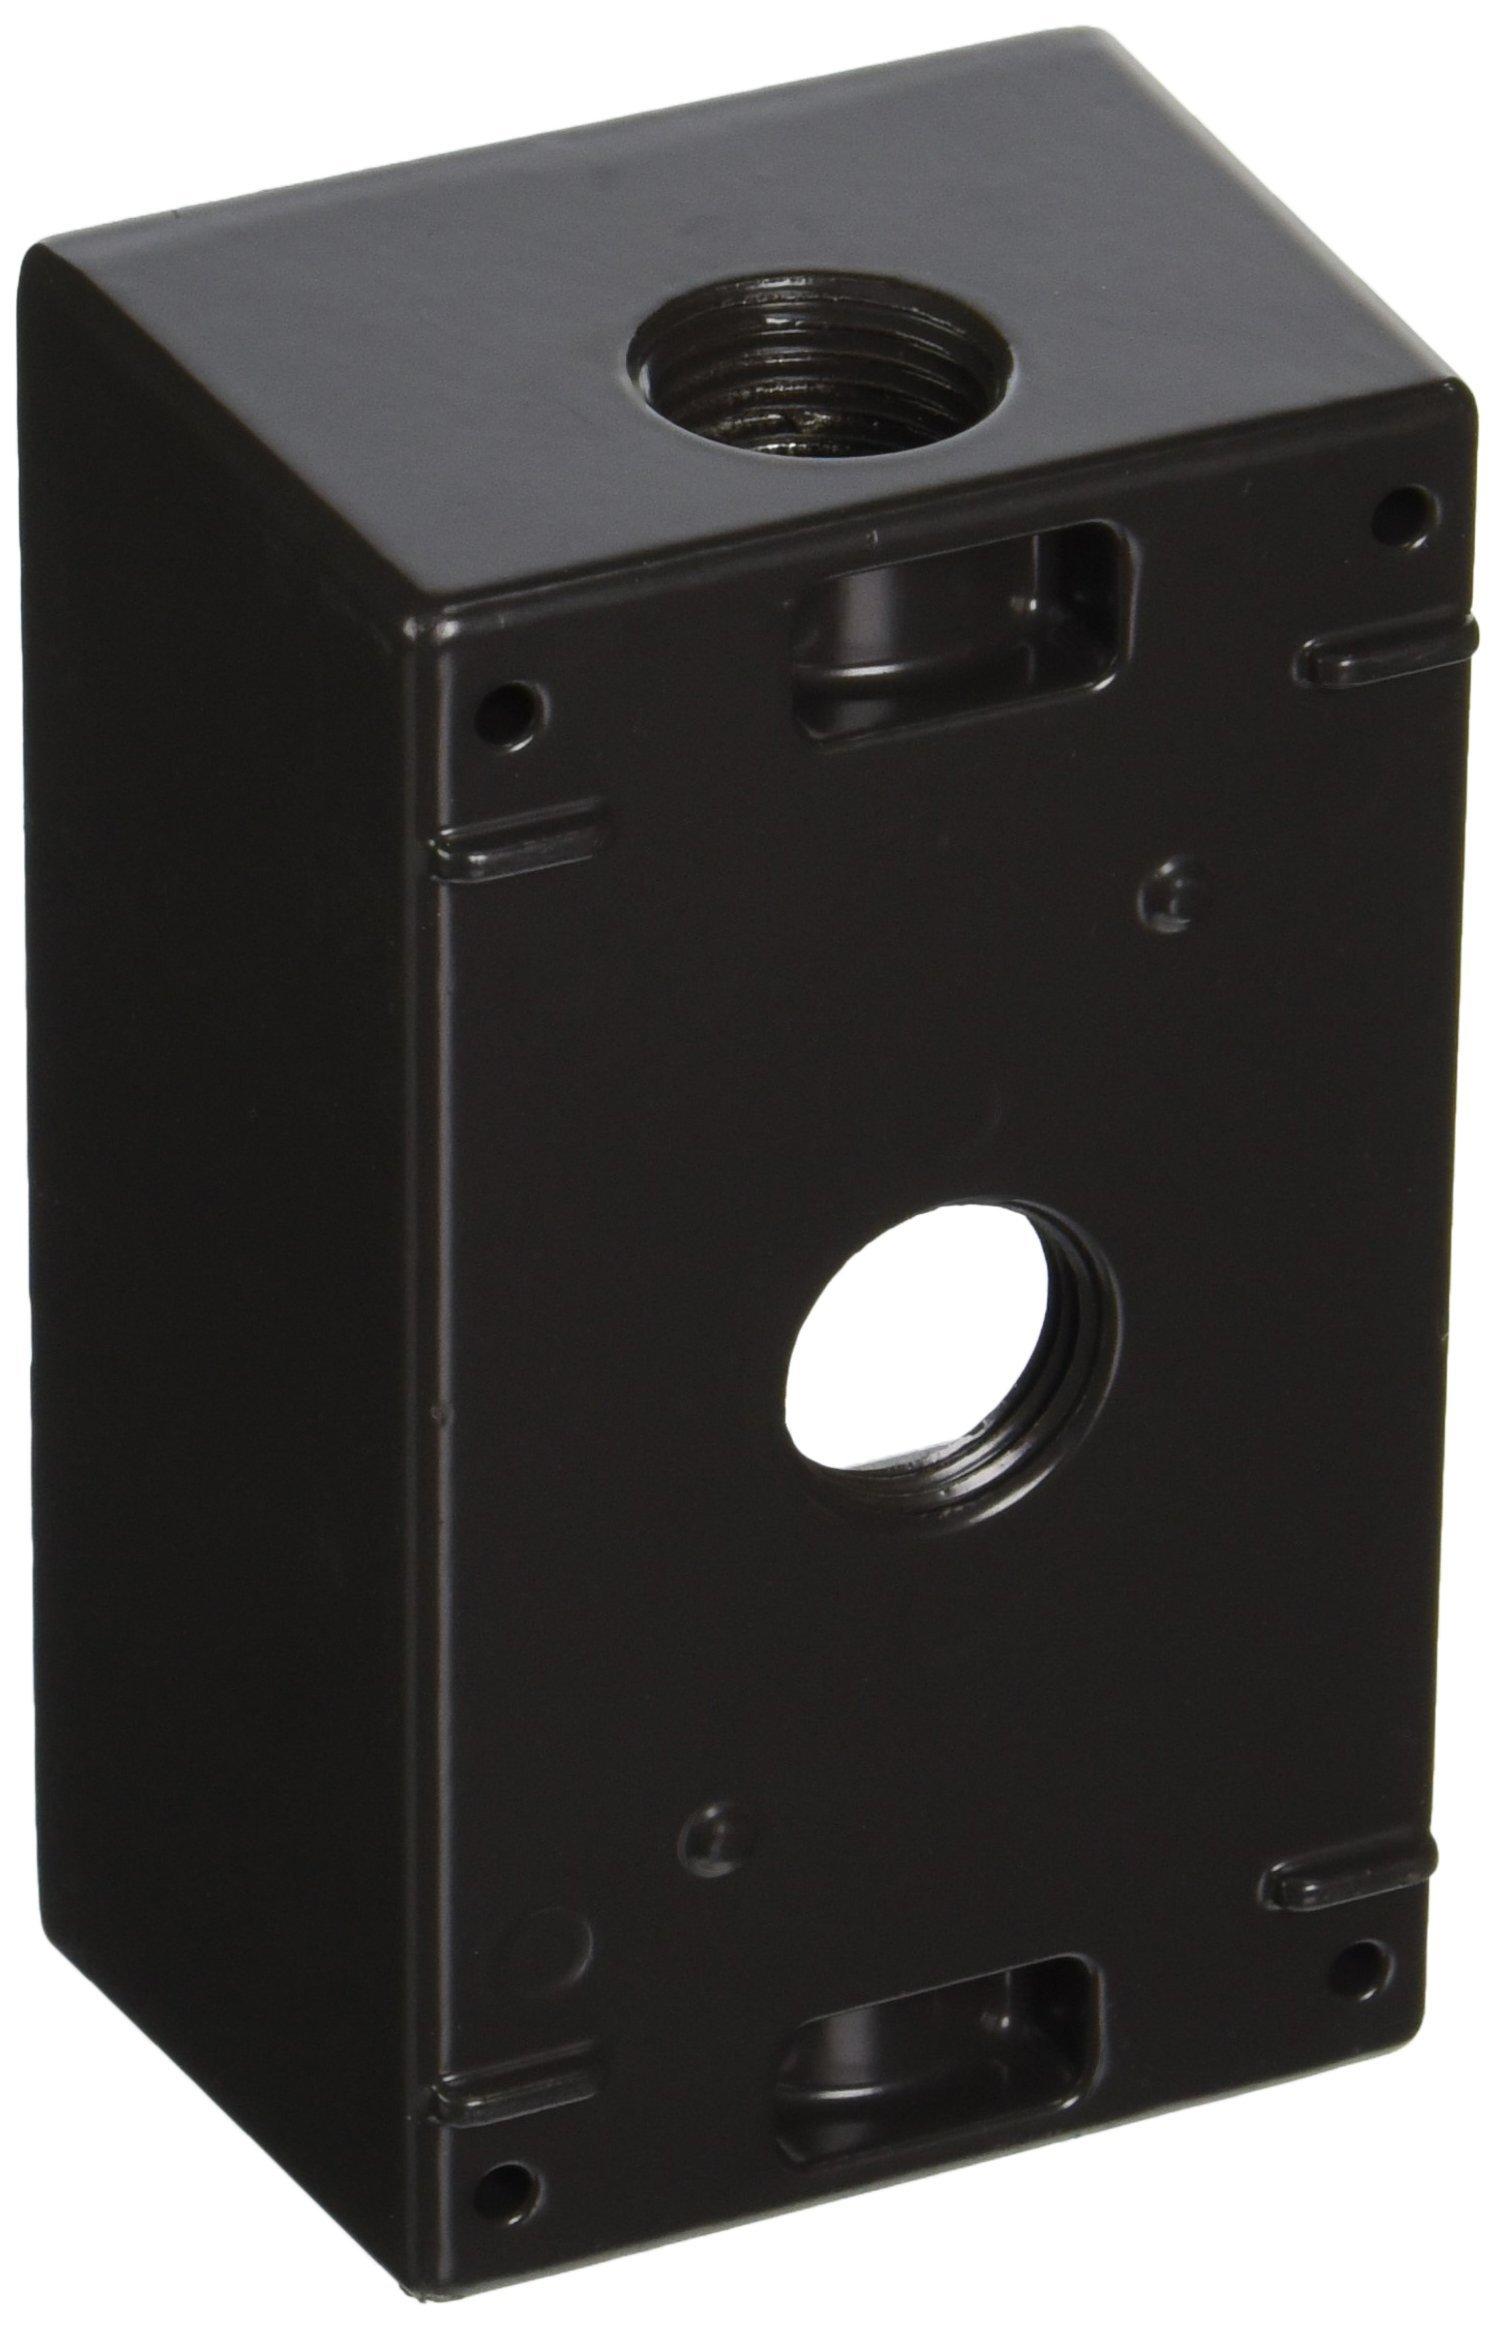 RAB Lighting B3A Weatherproof Single Gang Rectangular Box with 3 Holes, Aluminum, 1/2'' Tap Size, 2-3/4'' Length x 2'' Width x 4-3/4'' Height, Bronze Color